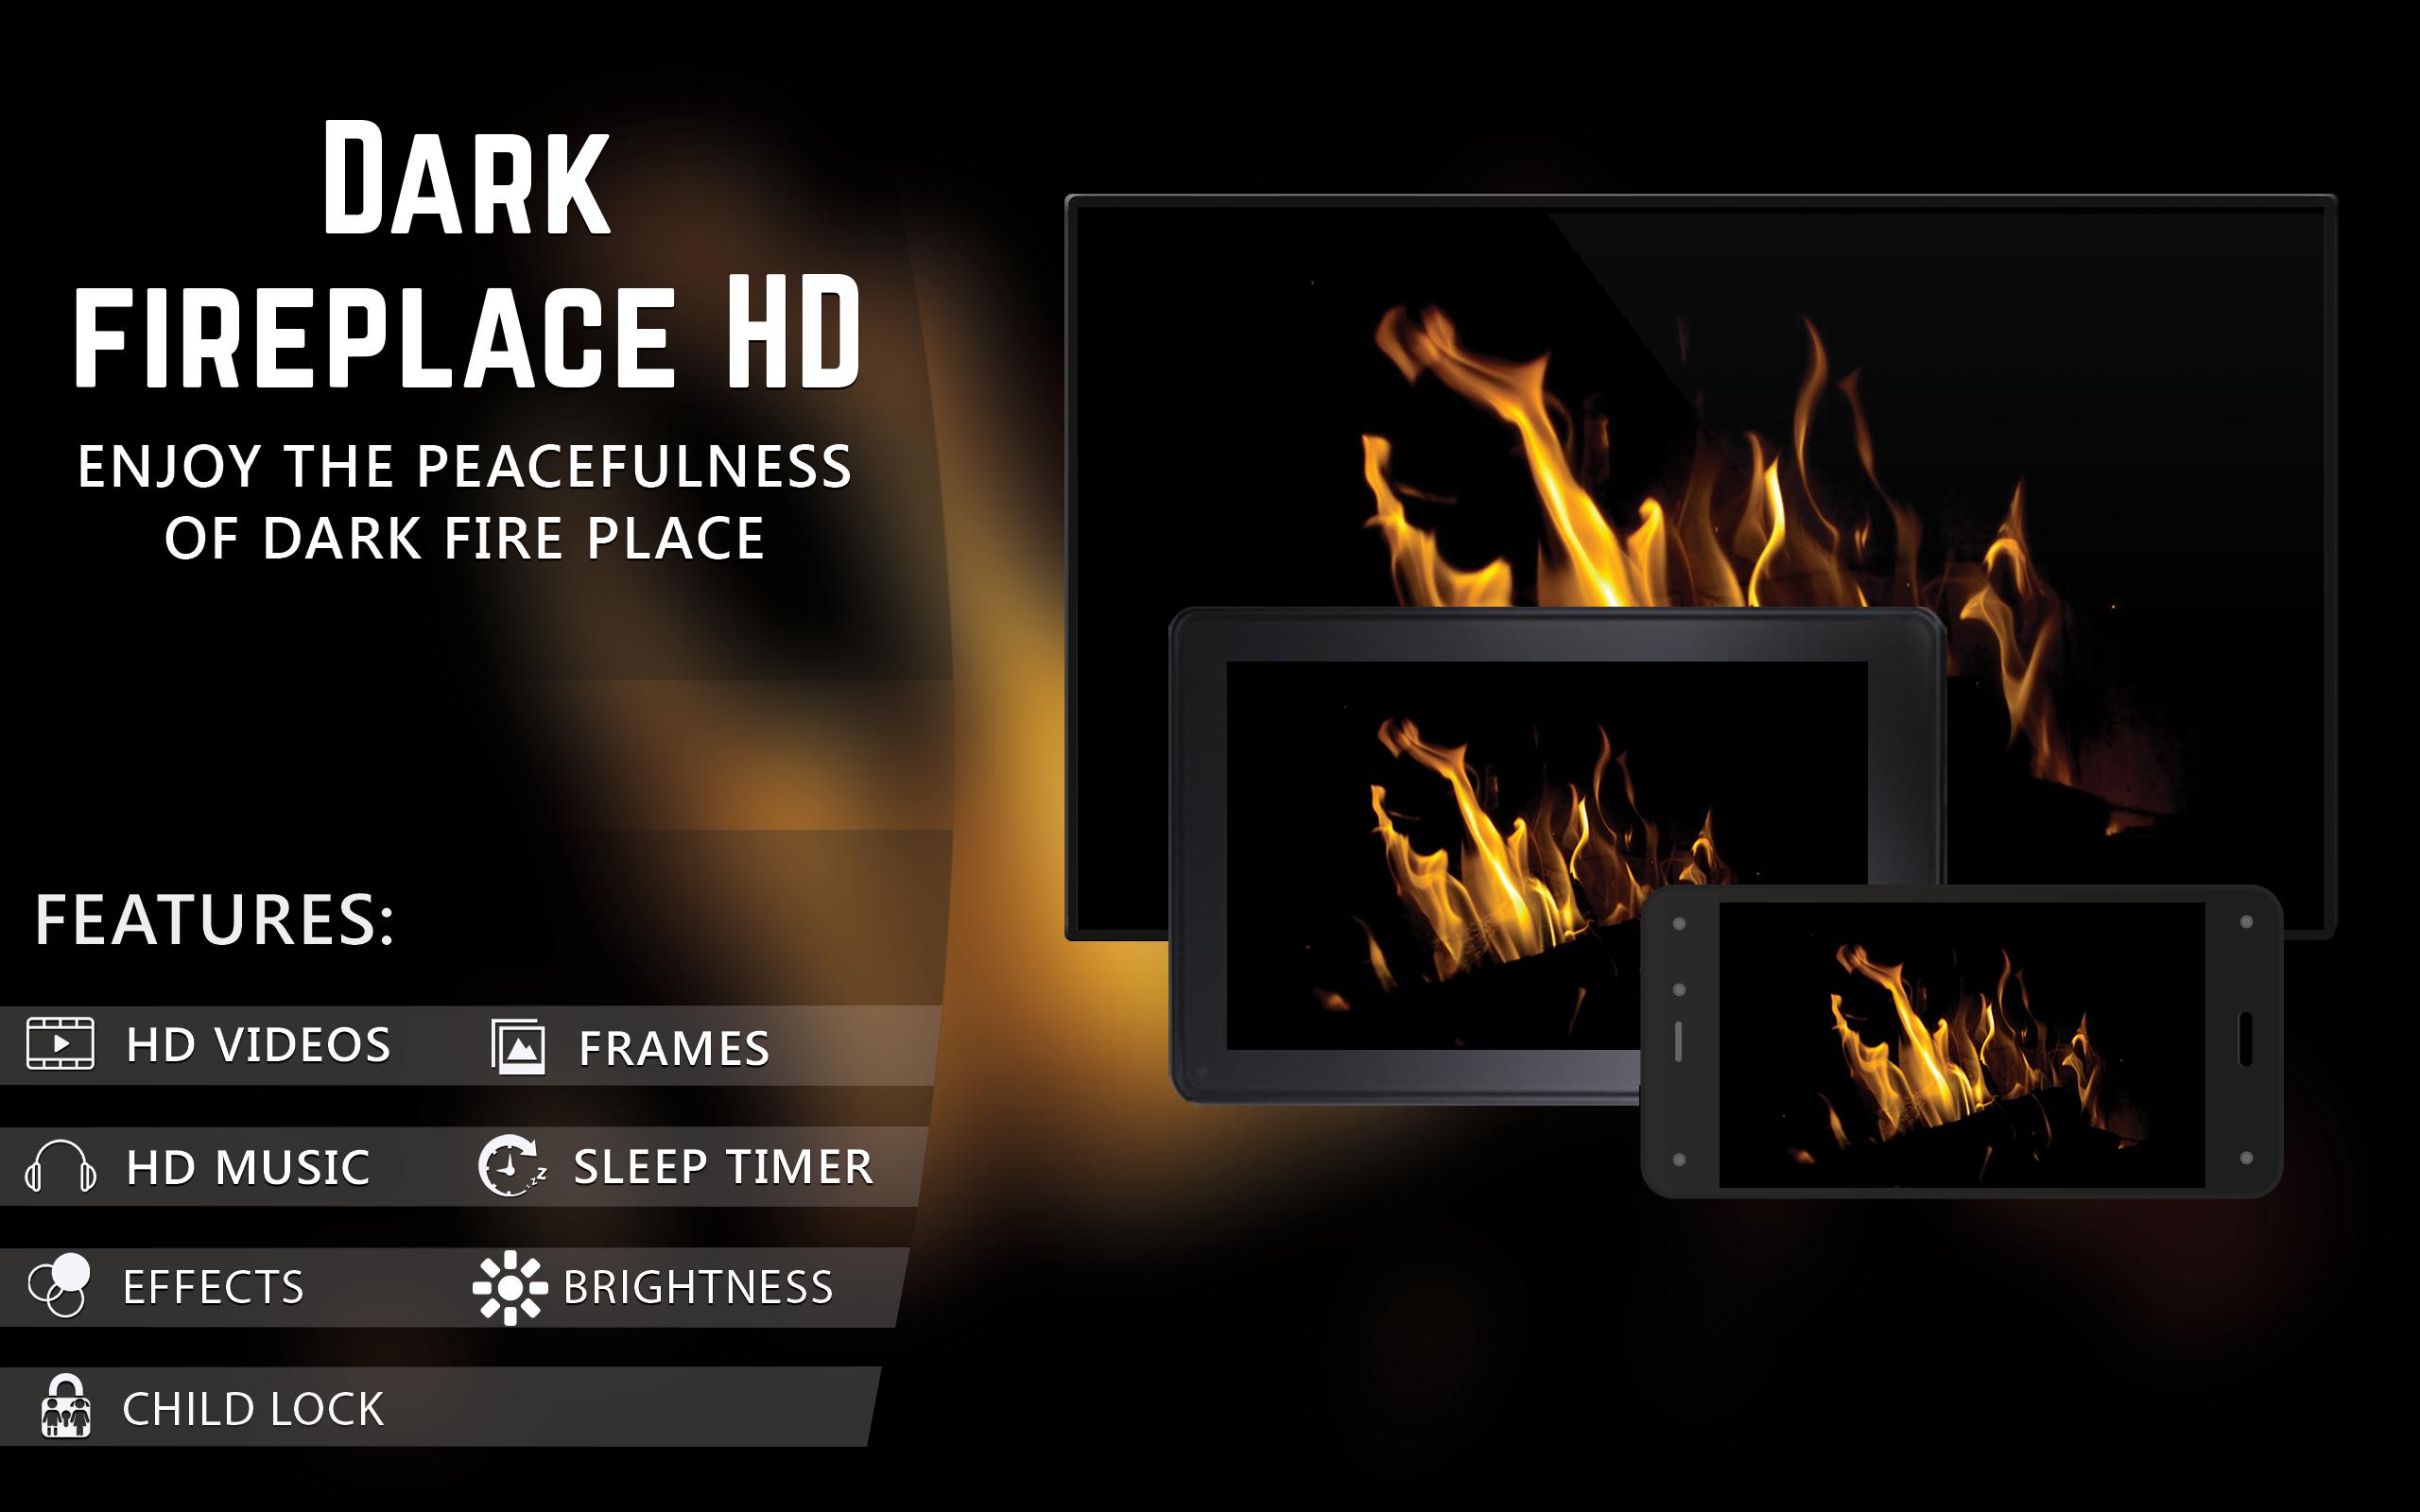 Amazoncom Dark Fireplace HD FREE Enjoy the winter with hot